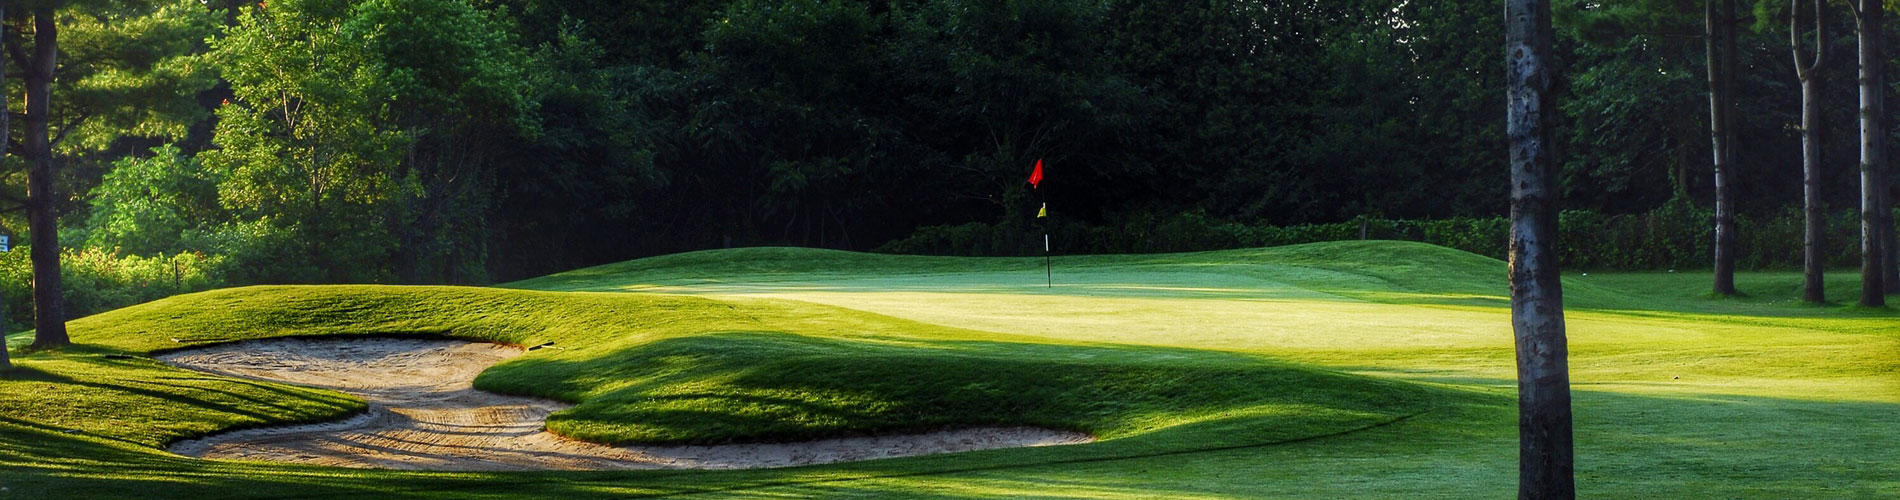 2018 Golf Carts >> Carlisle Golf Club - Hamilton - Golf Discounts and Coupons on Green Fees